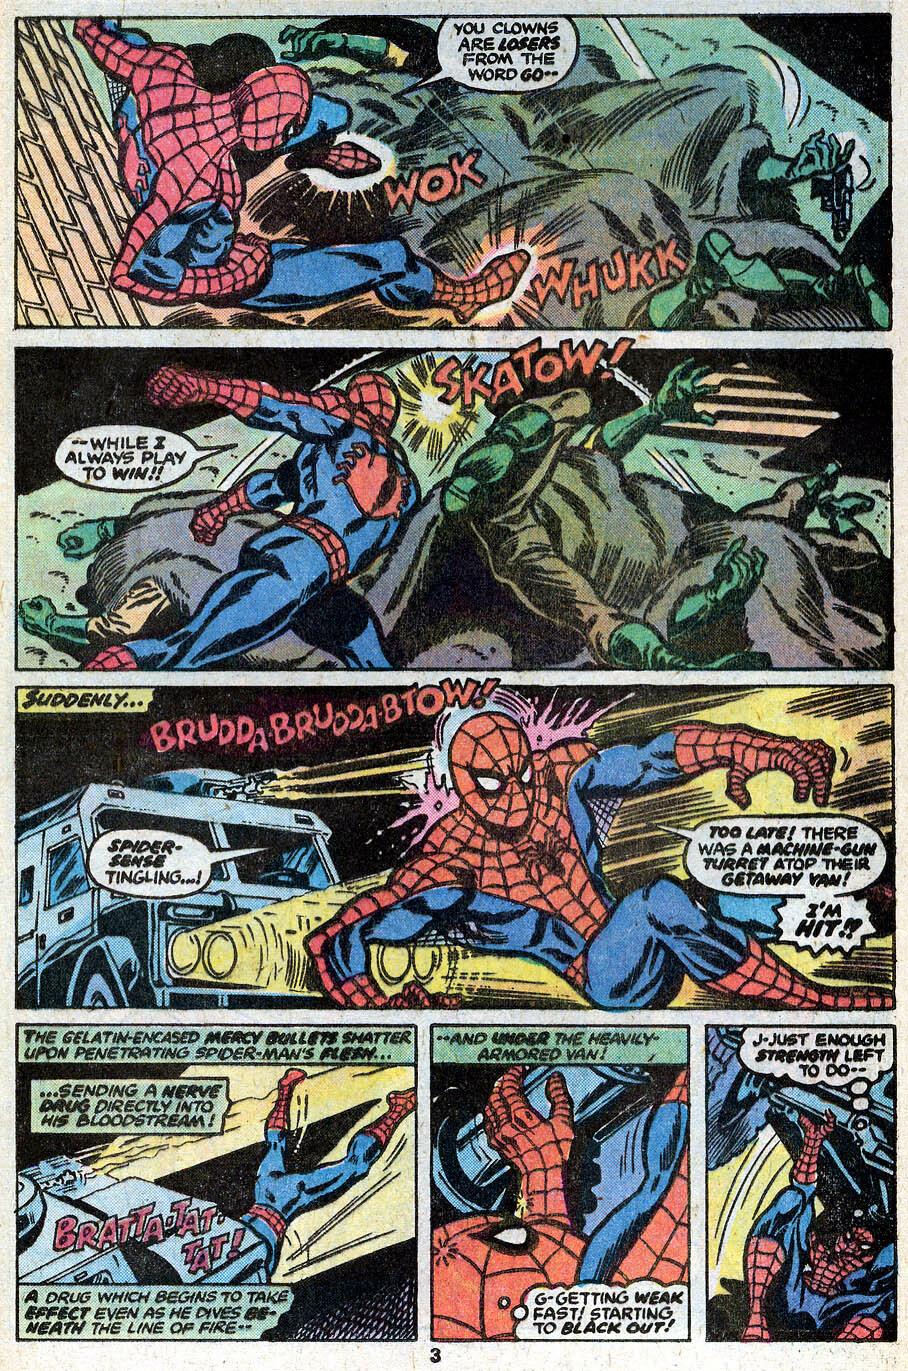 Marvel Team-Up #72